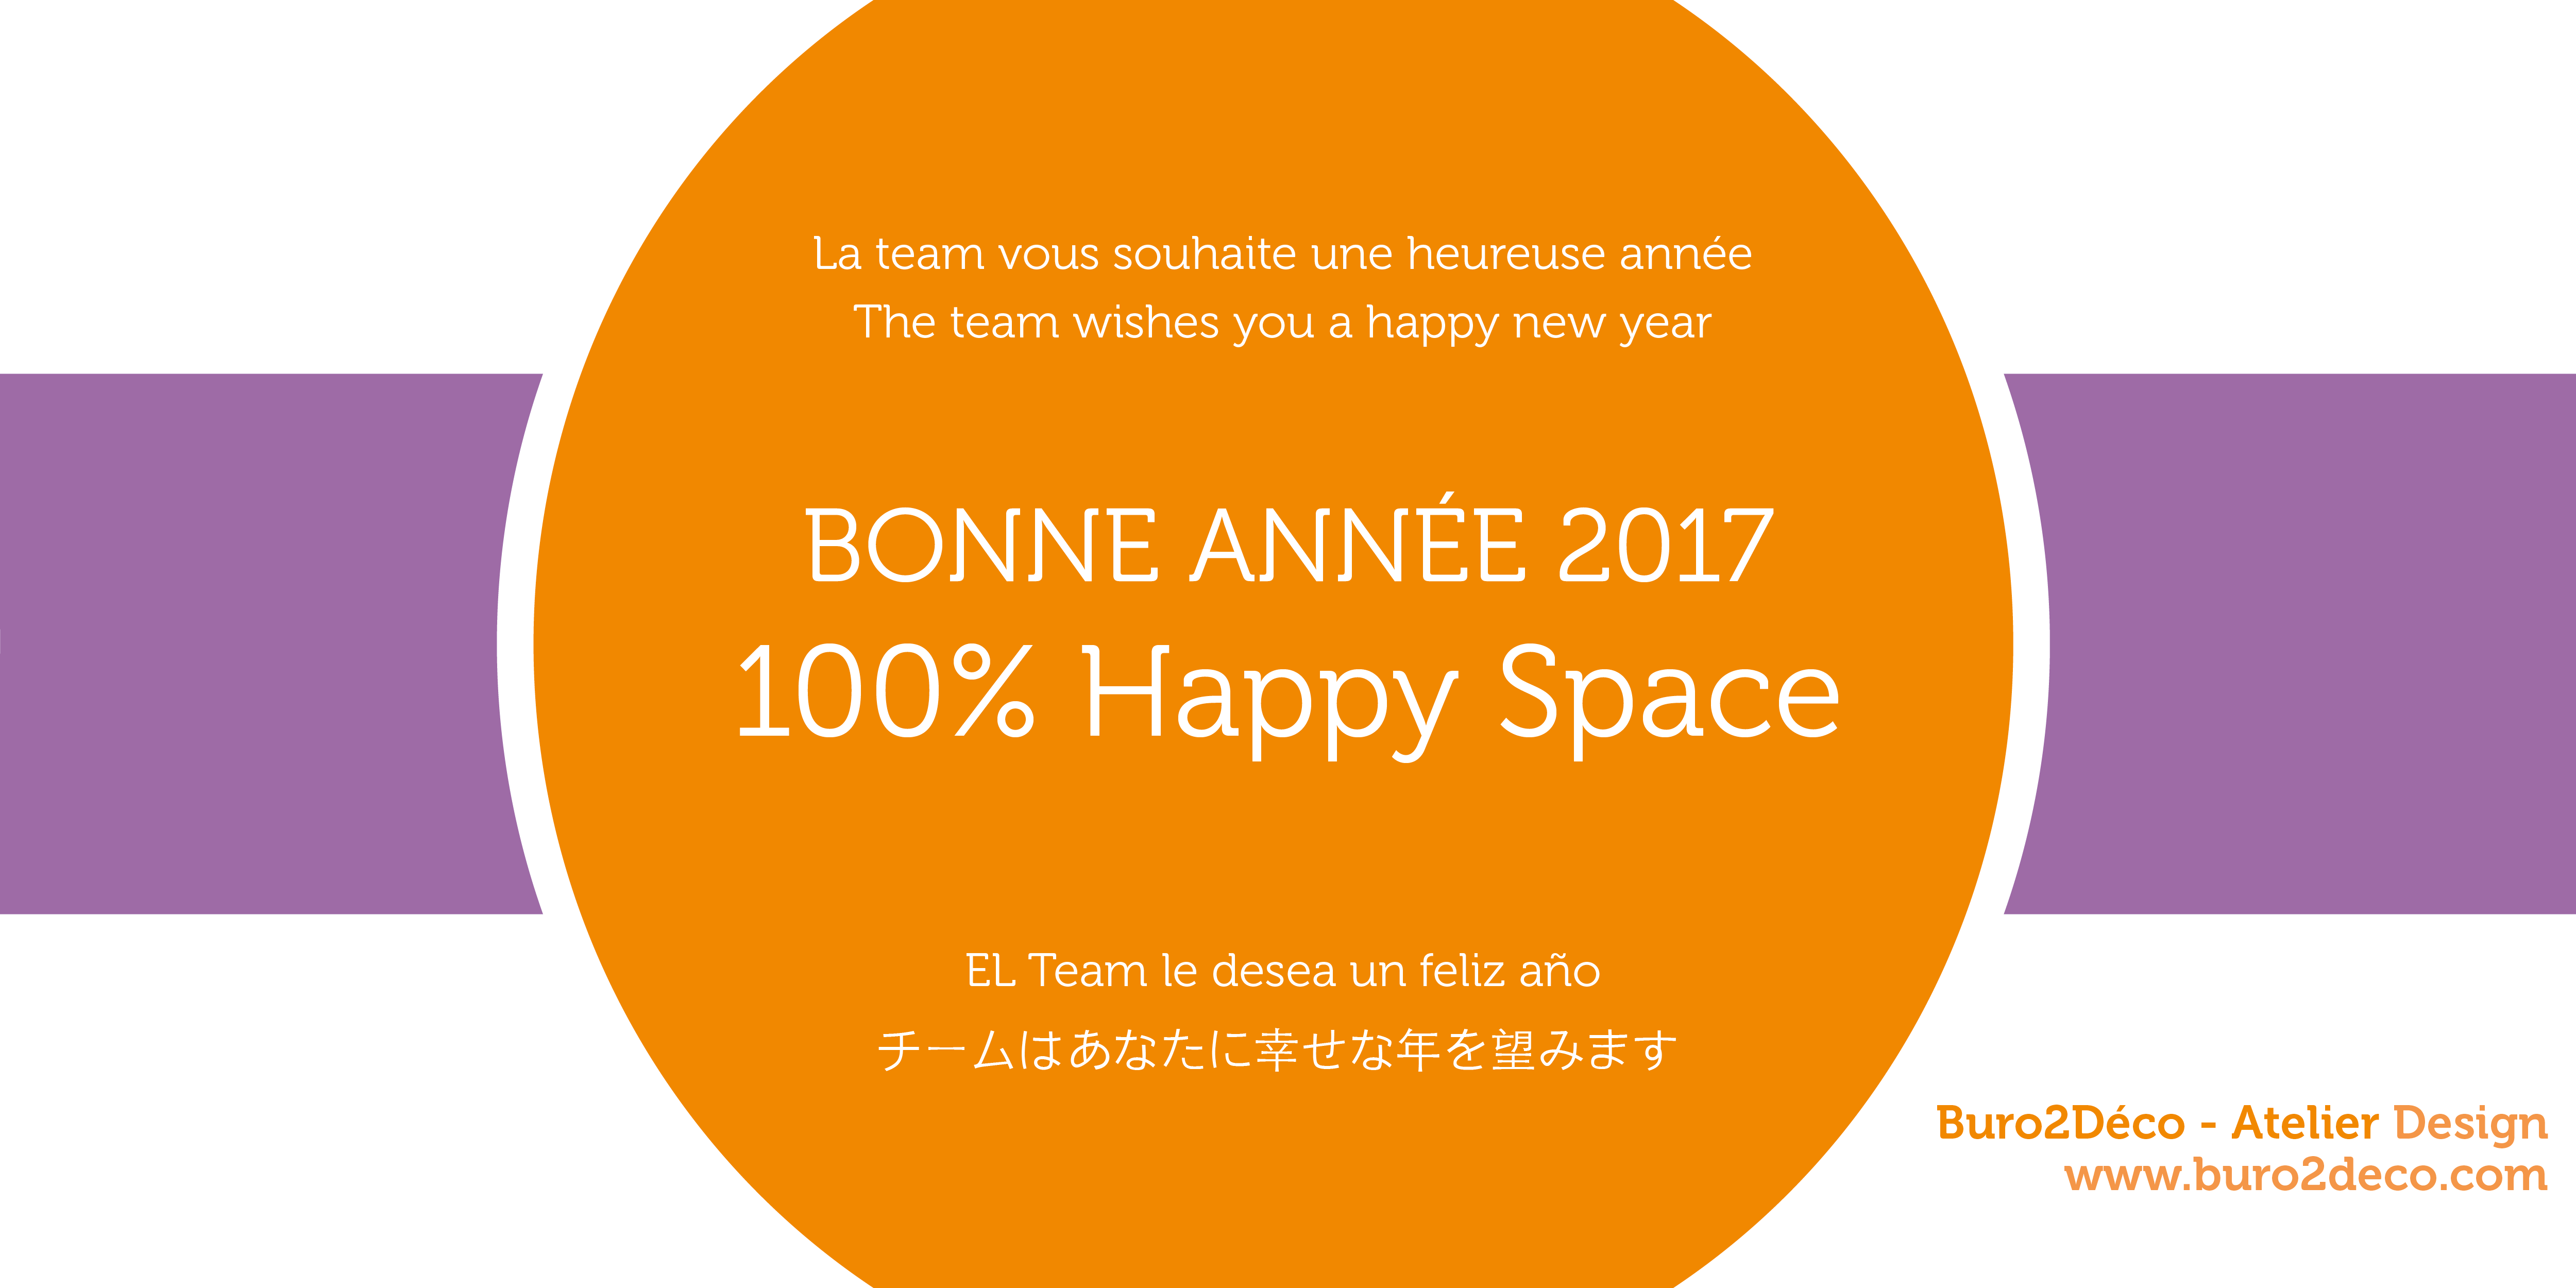 #2017 #Tous nos voeux #BonneAnnée #HappyNewYear #FelizAno #新年あけましておめでとうございます!